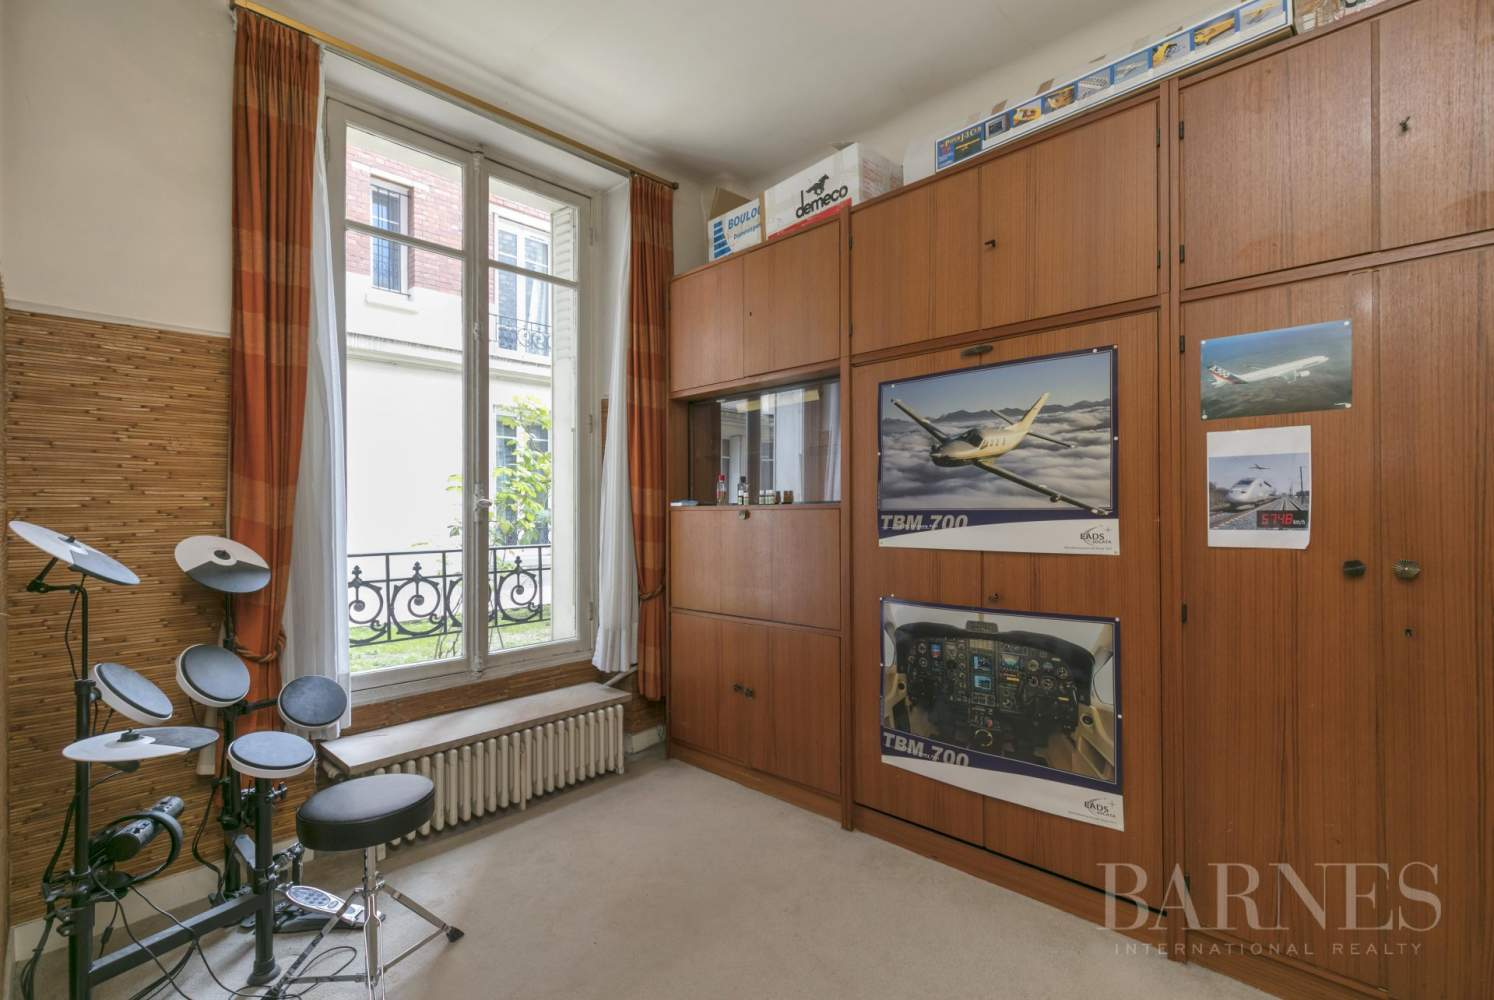 Exclusive - Neuilly - Pasteur - Garden level - 3-4 bedrooms picture 10